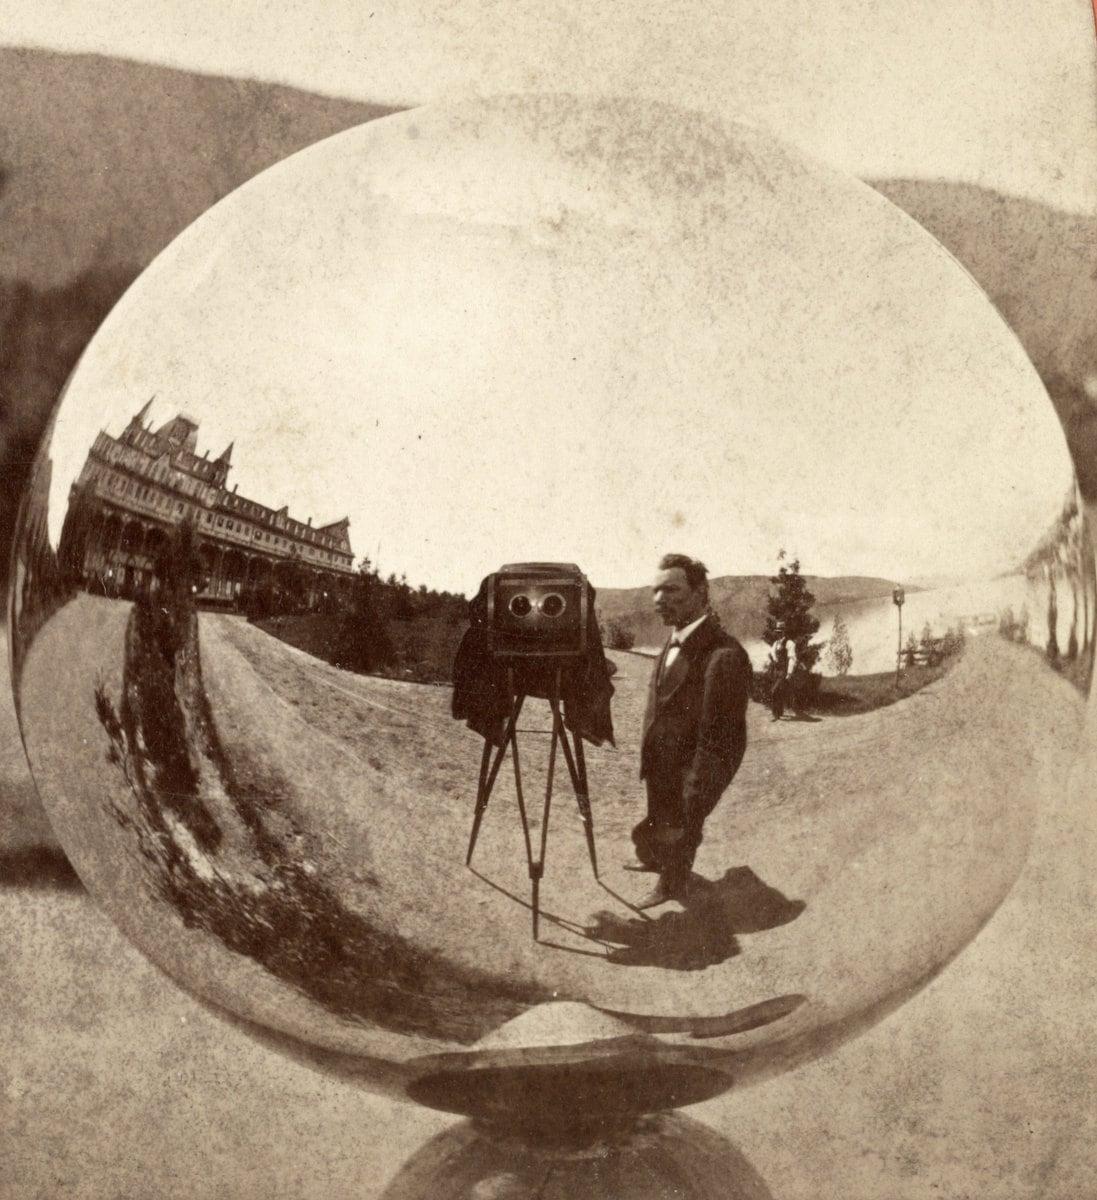 Antique selfie - Globe reflection in Glen's Falls New York (1870s) at ClickAmericana com